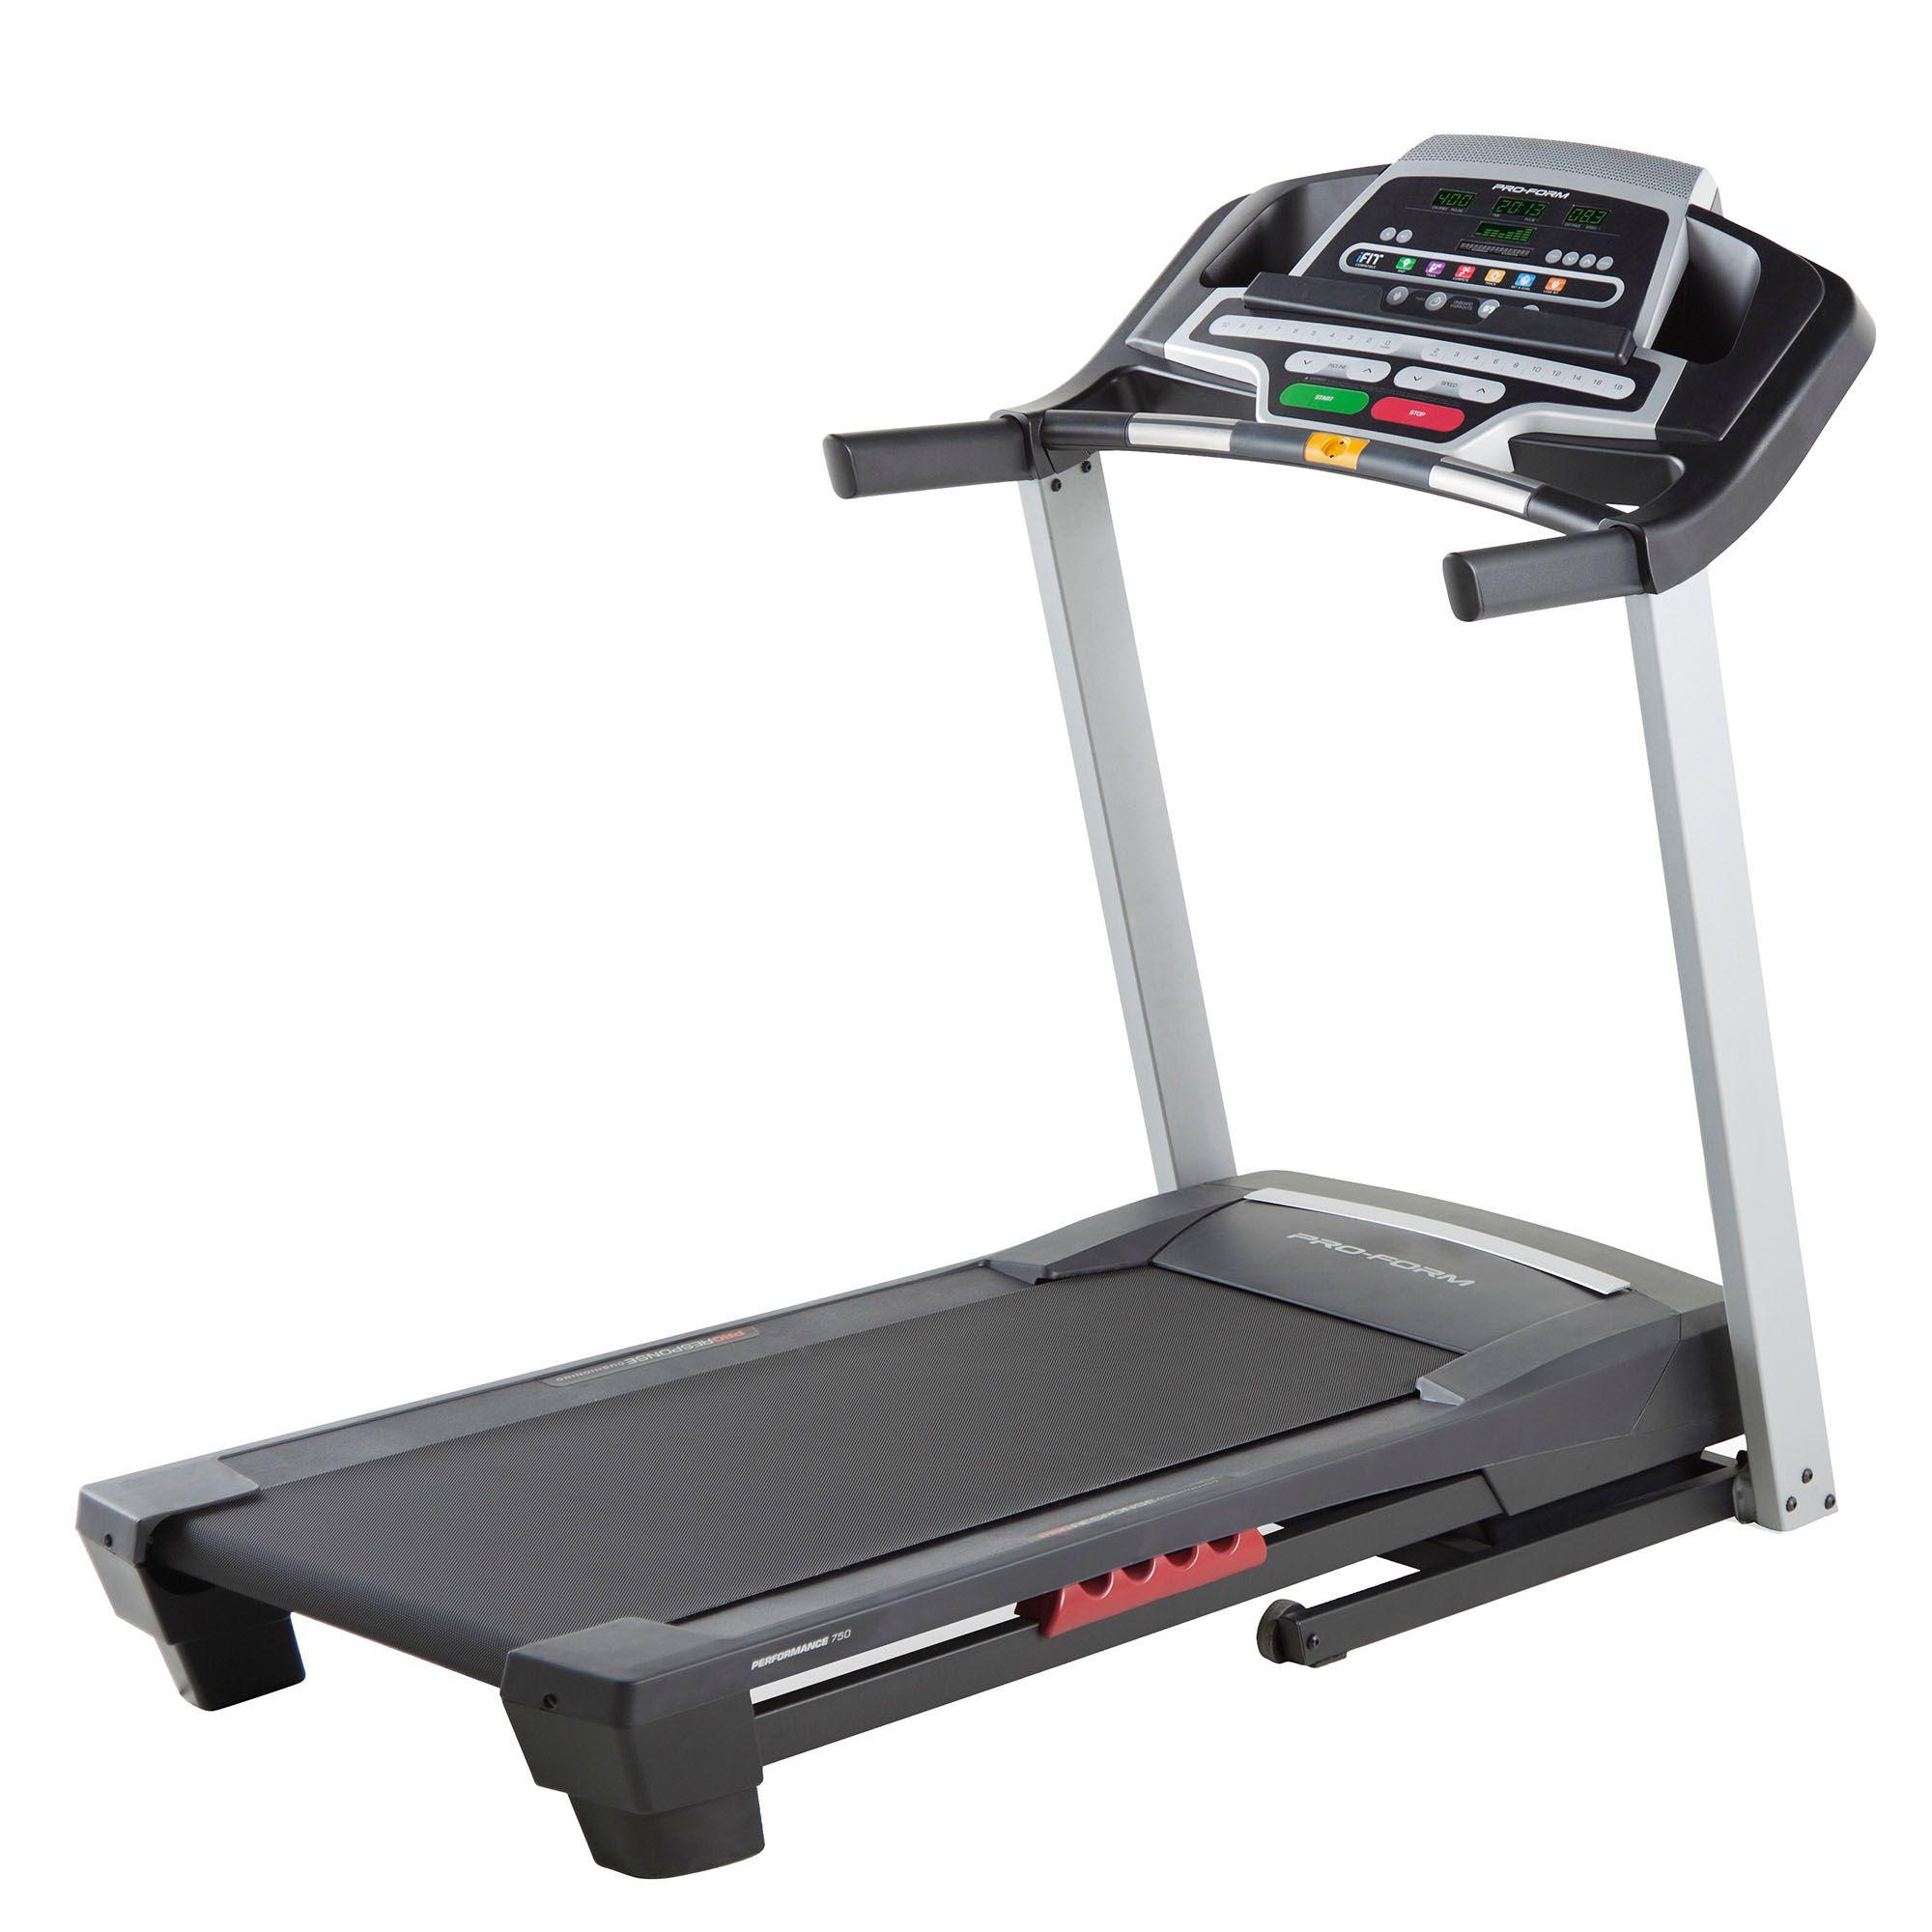 Proform Performance 750 Treadmill